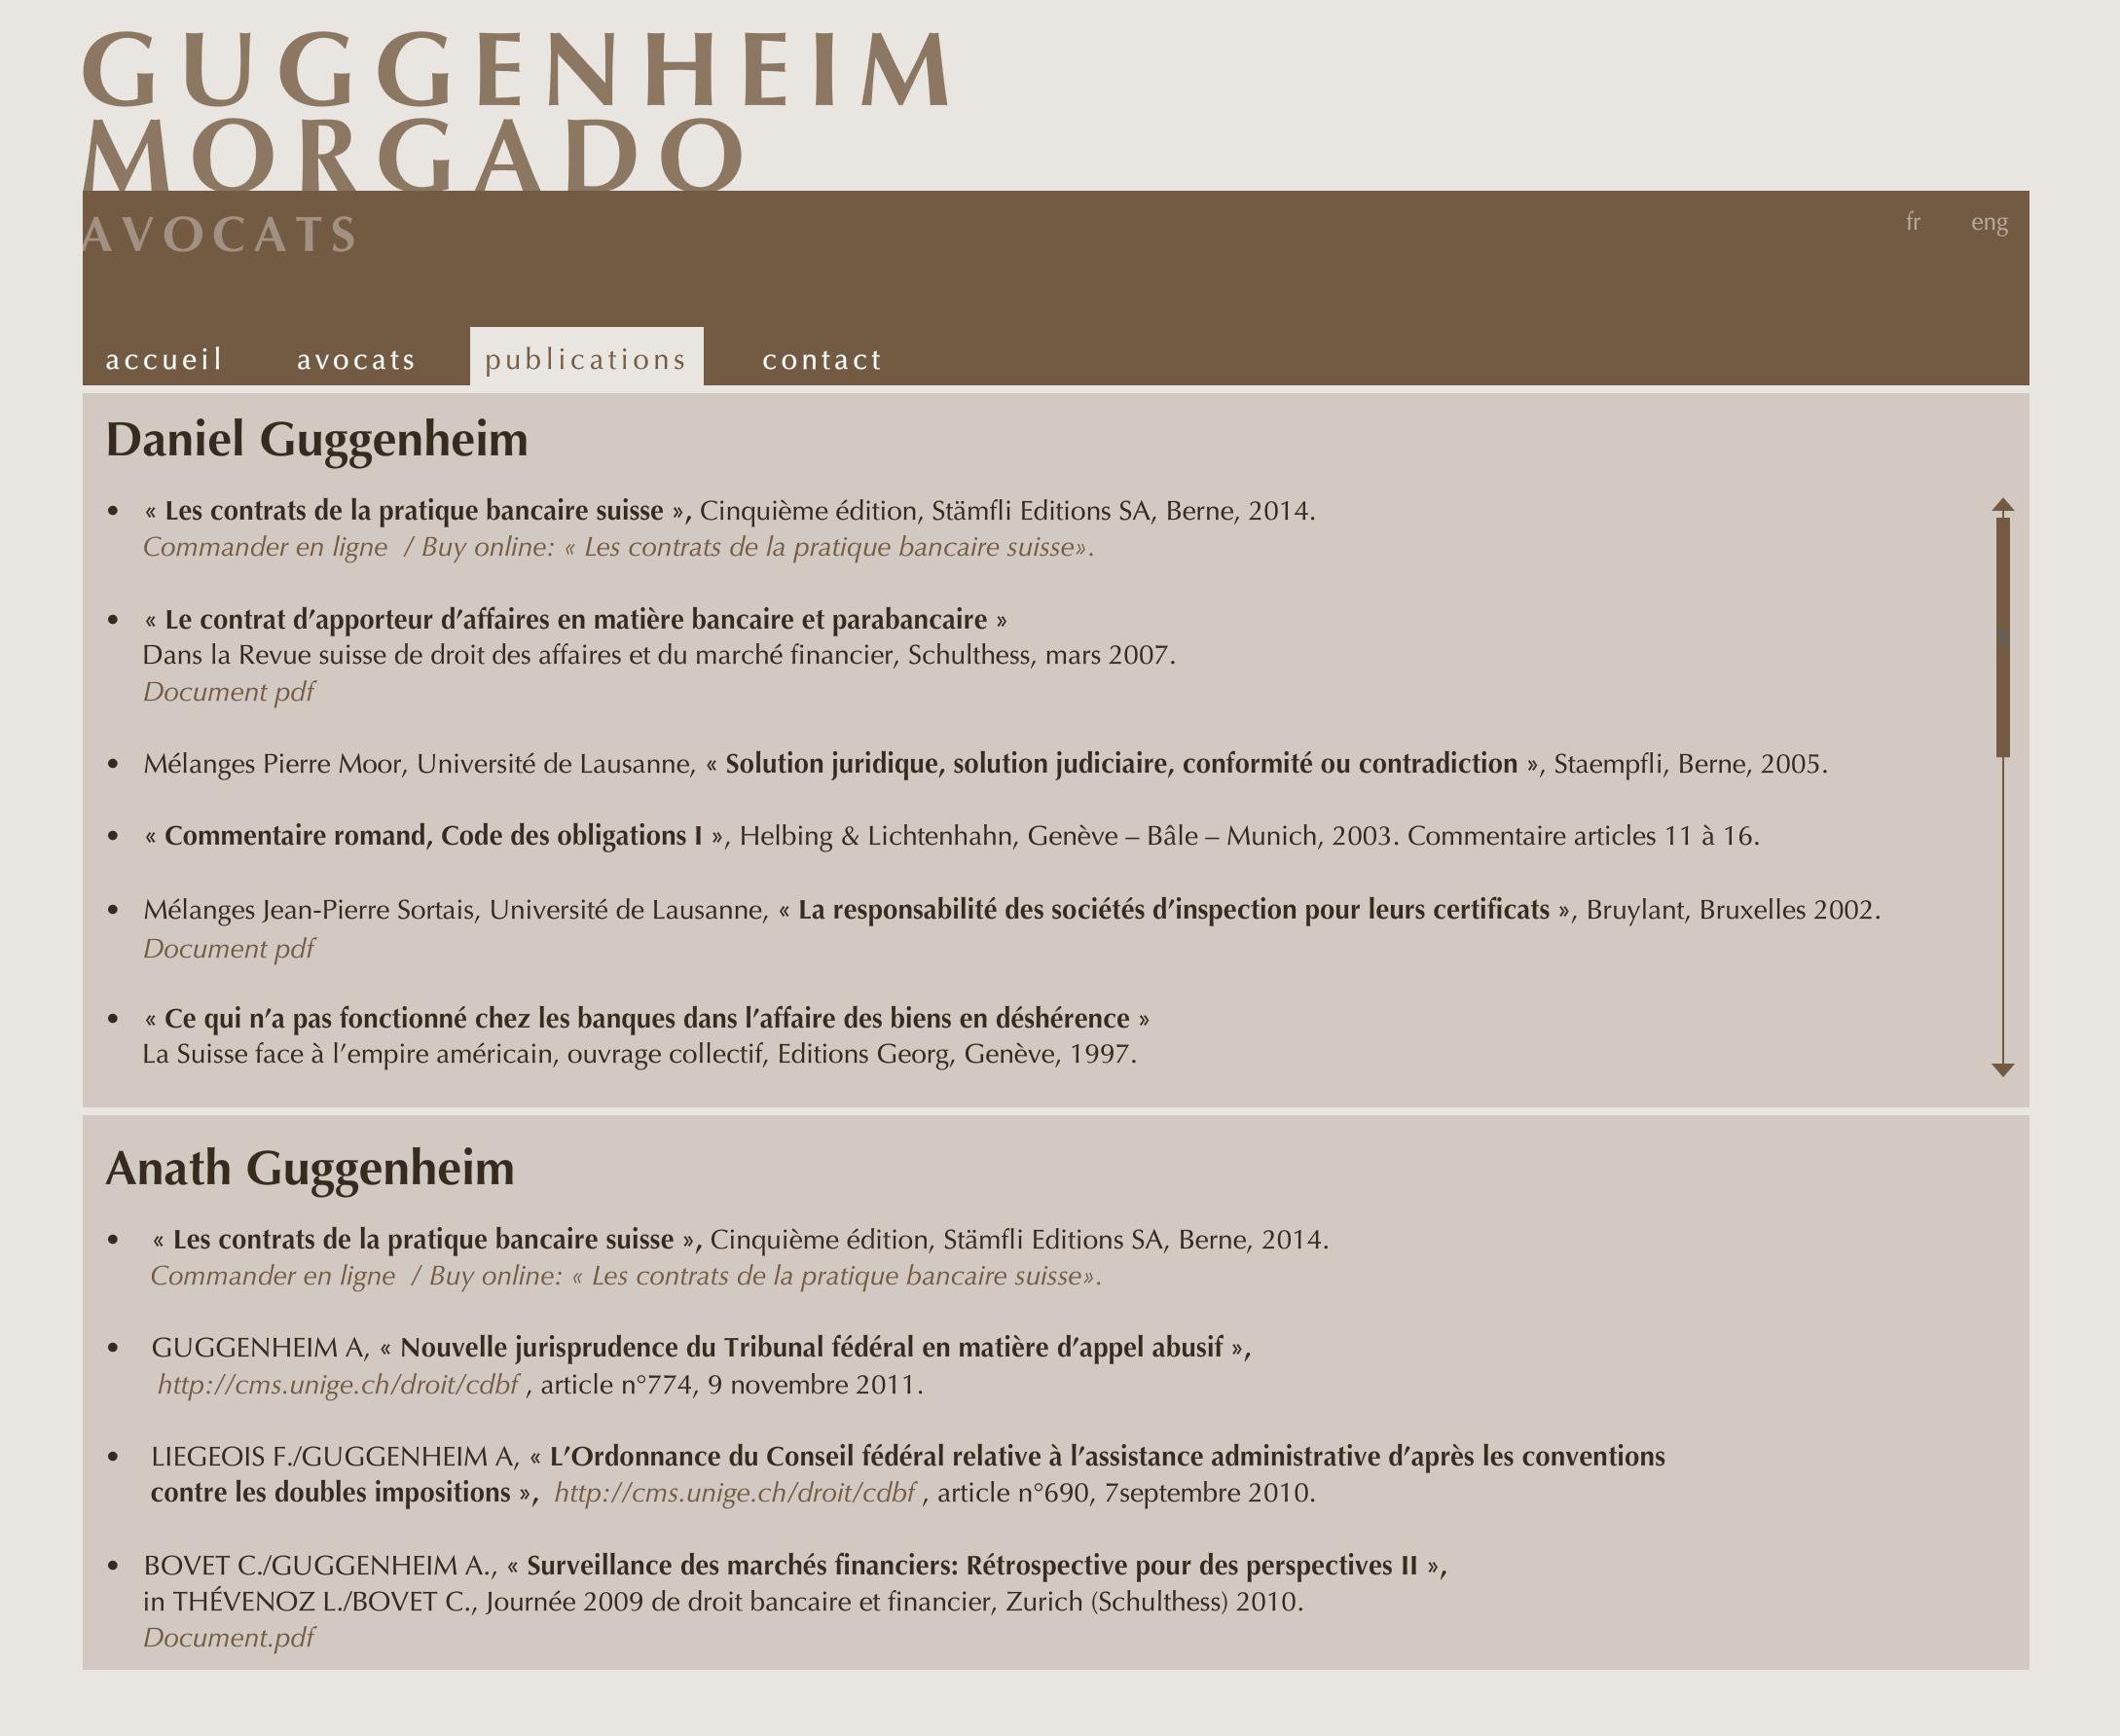 glegal - publications